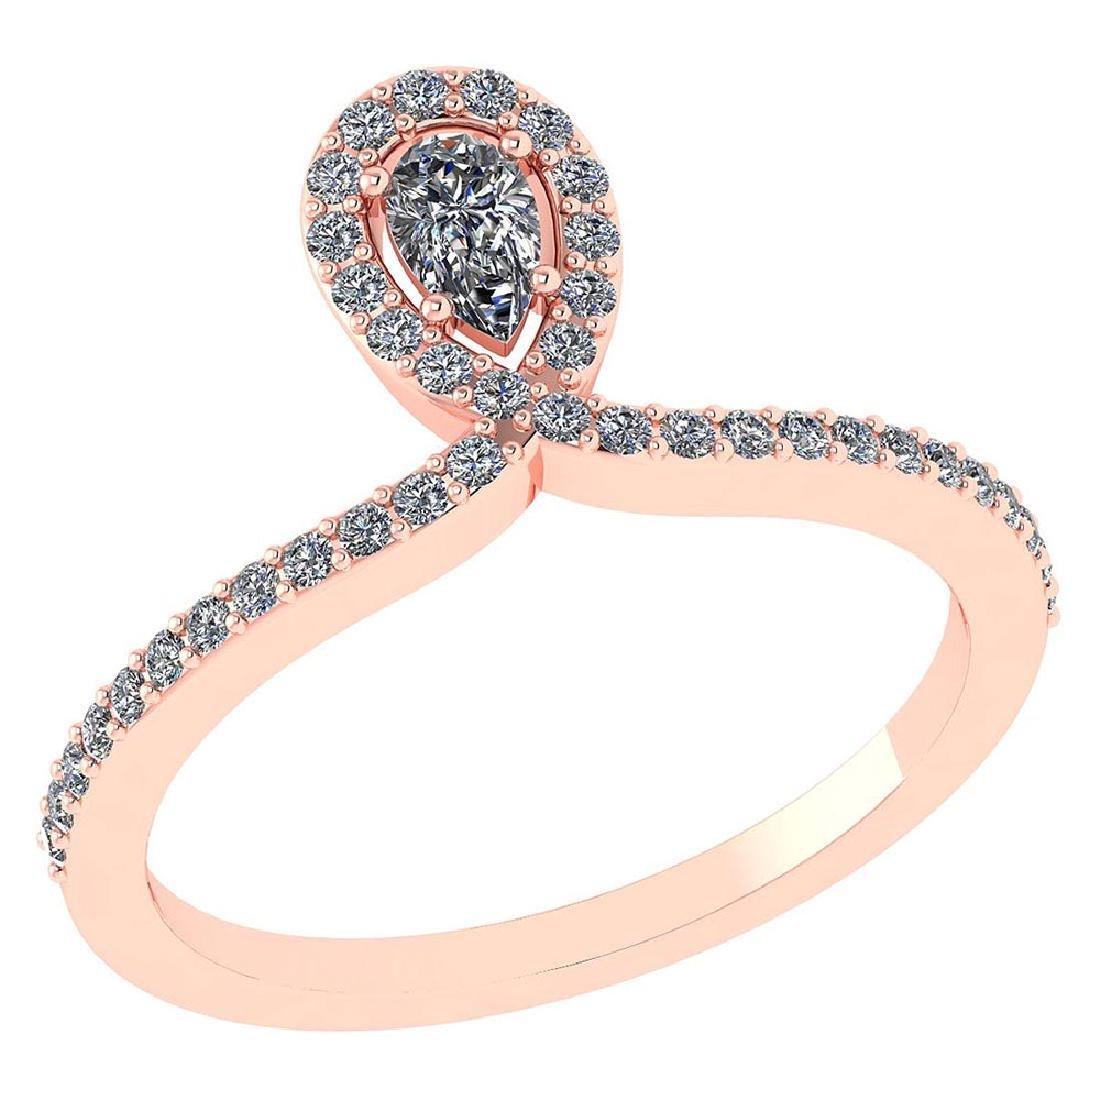 0.57 Ctw Pear Cut Diamond 14k Rose Gold Halo Ring VS/SI